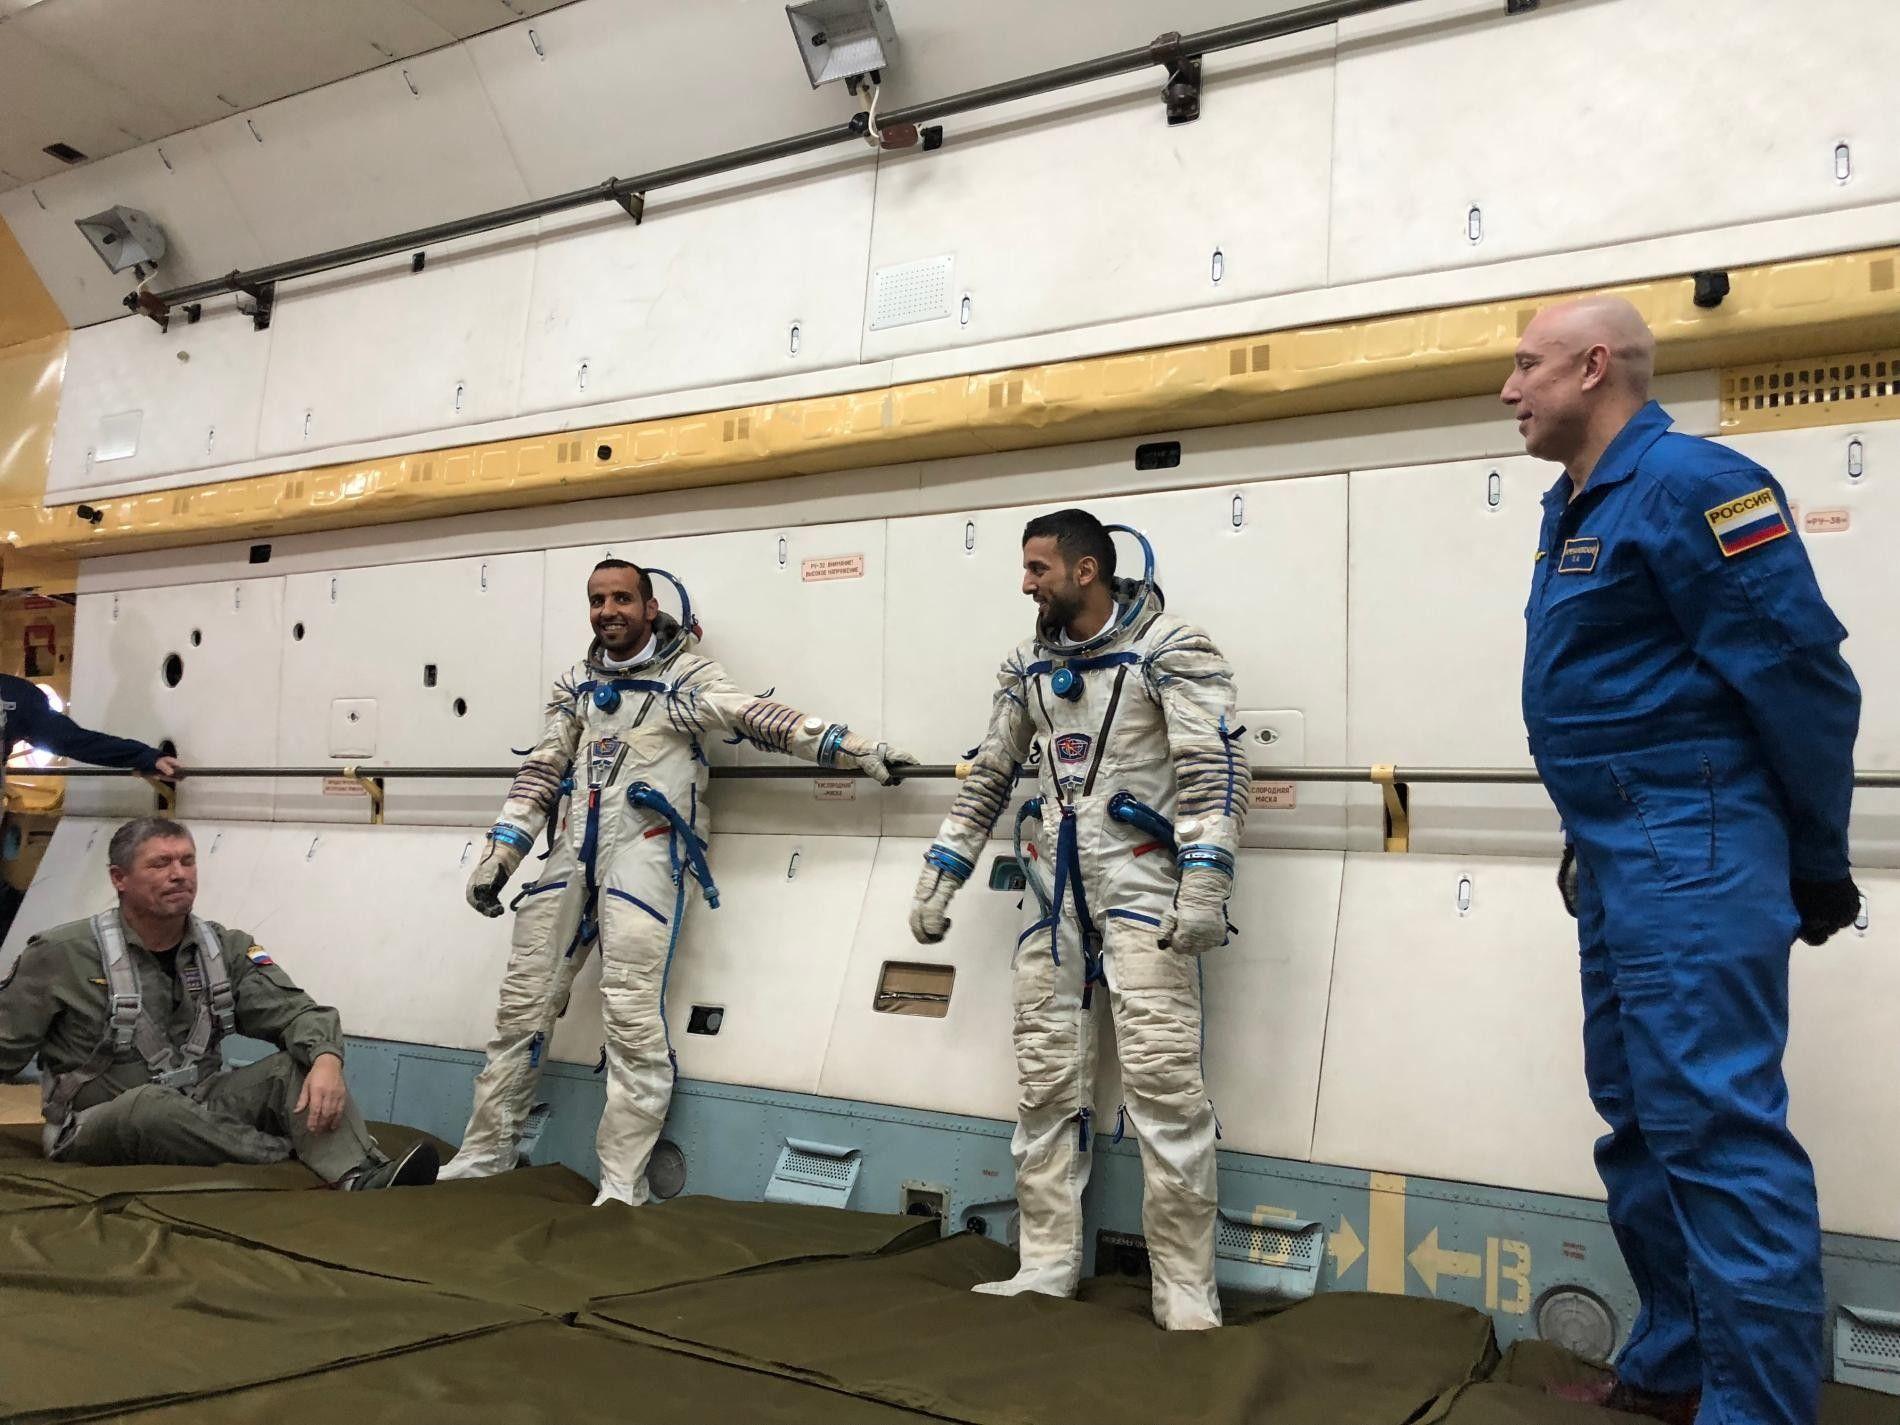 Os astronautas emiradenses, Hazzaa AlMansoori e Sultan AlNeyadi, durante os treinos.